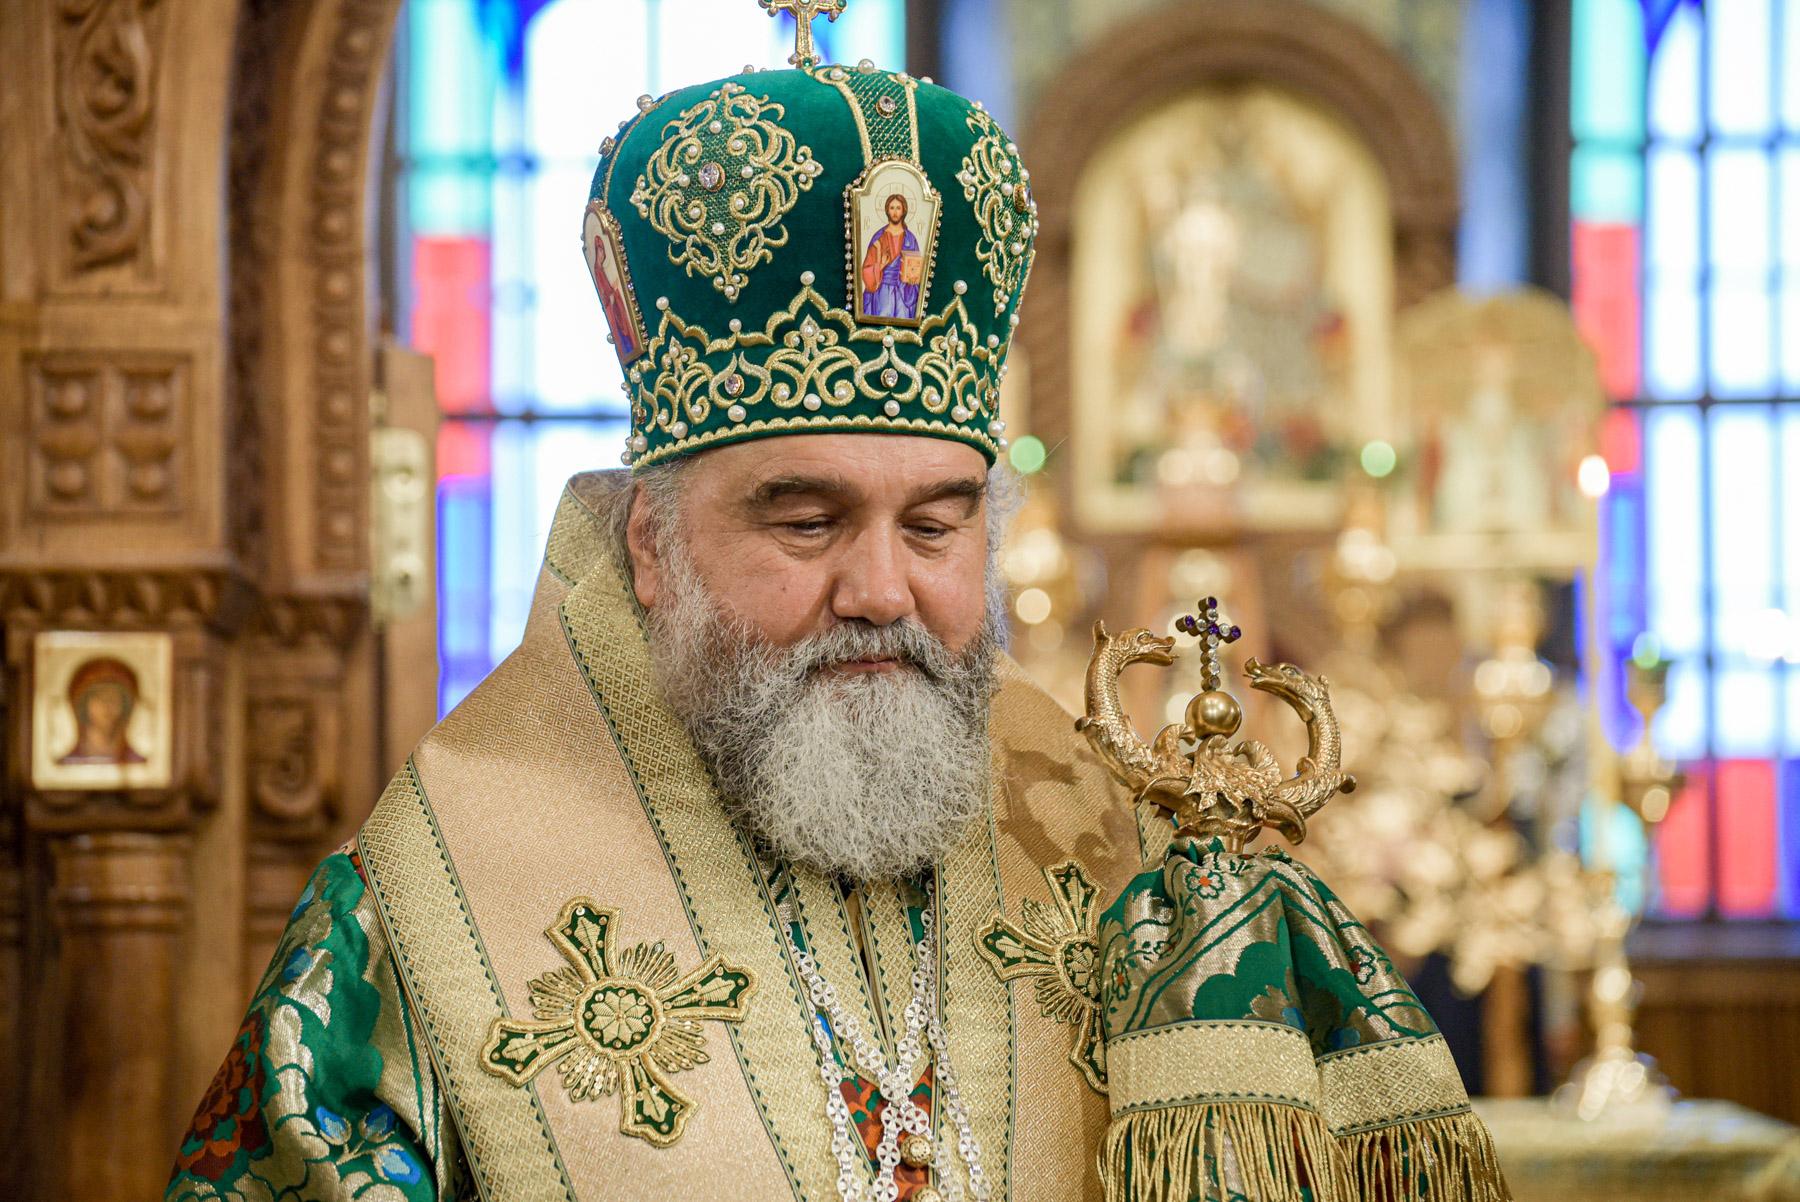 photos of orthodox christmas 0264 1